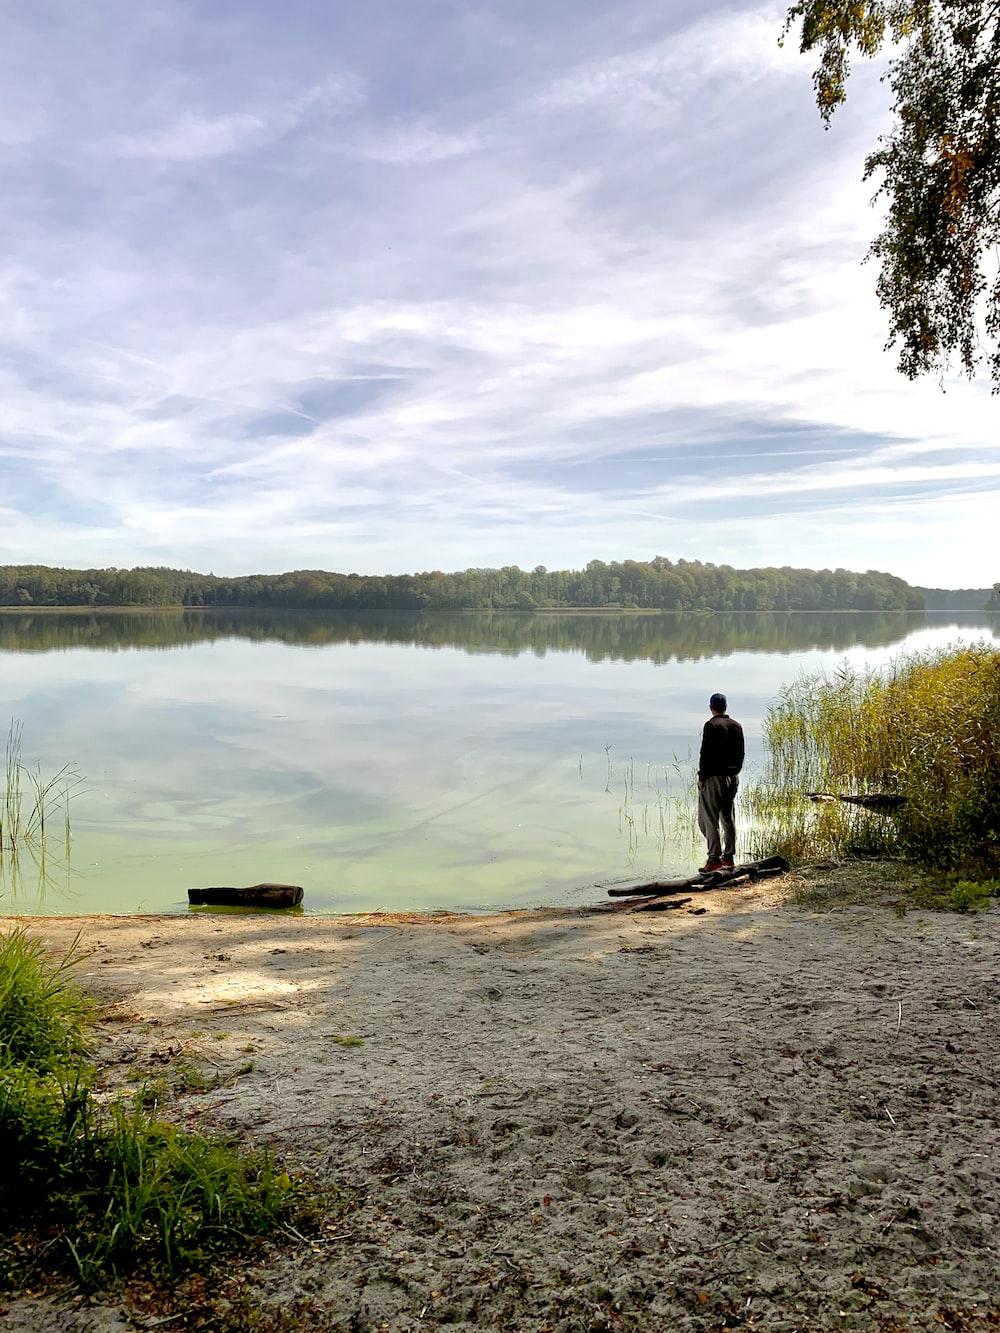 man standing front of lake during daytime